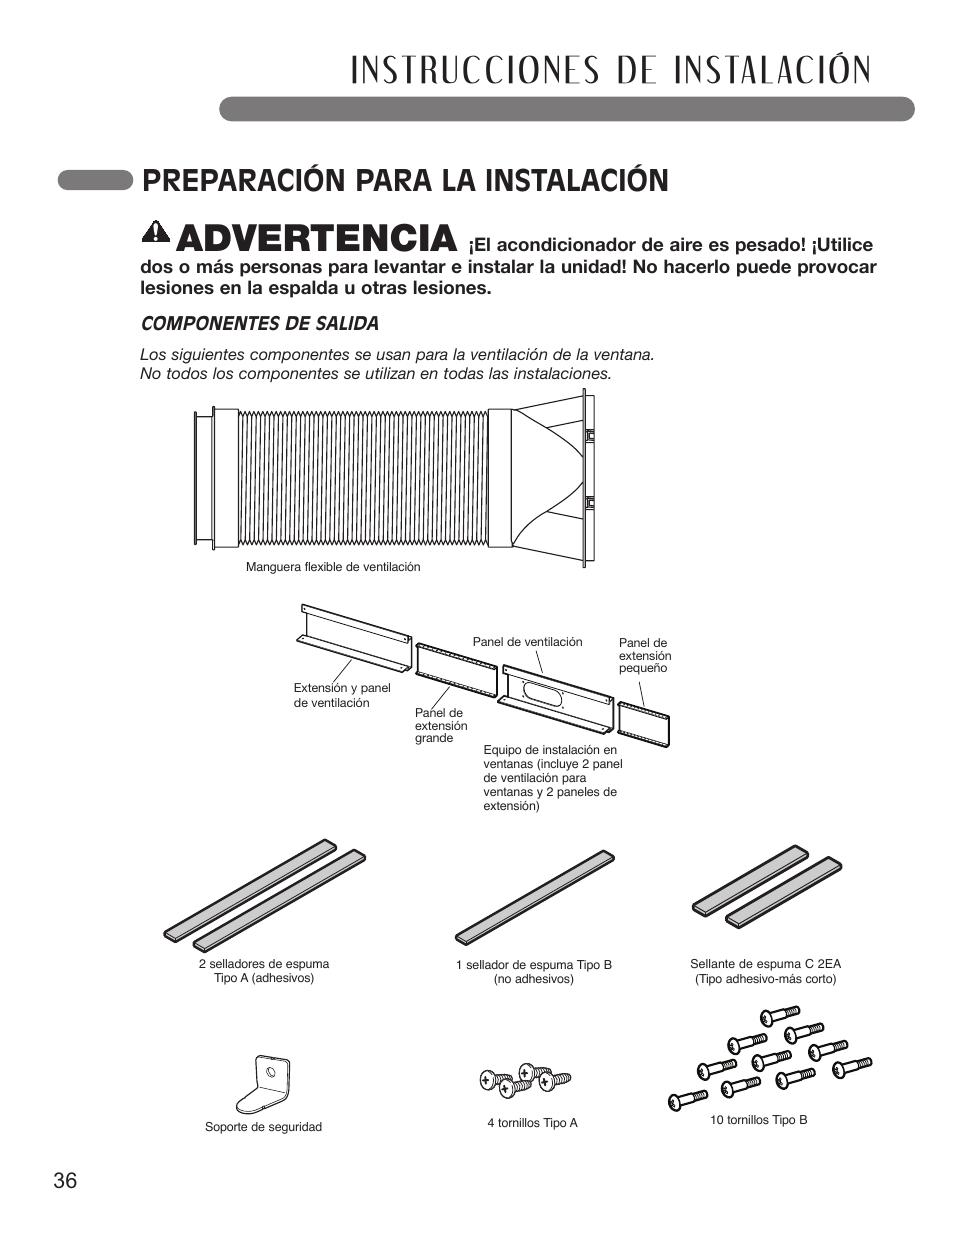 advertencia preparaci n para la instalaci n 36 espa ol lg rh manualsdir com Cartoon Manual Corvette Owners Manual